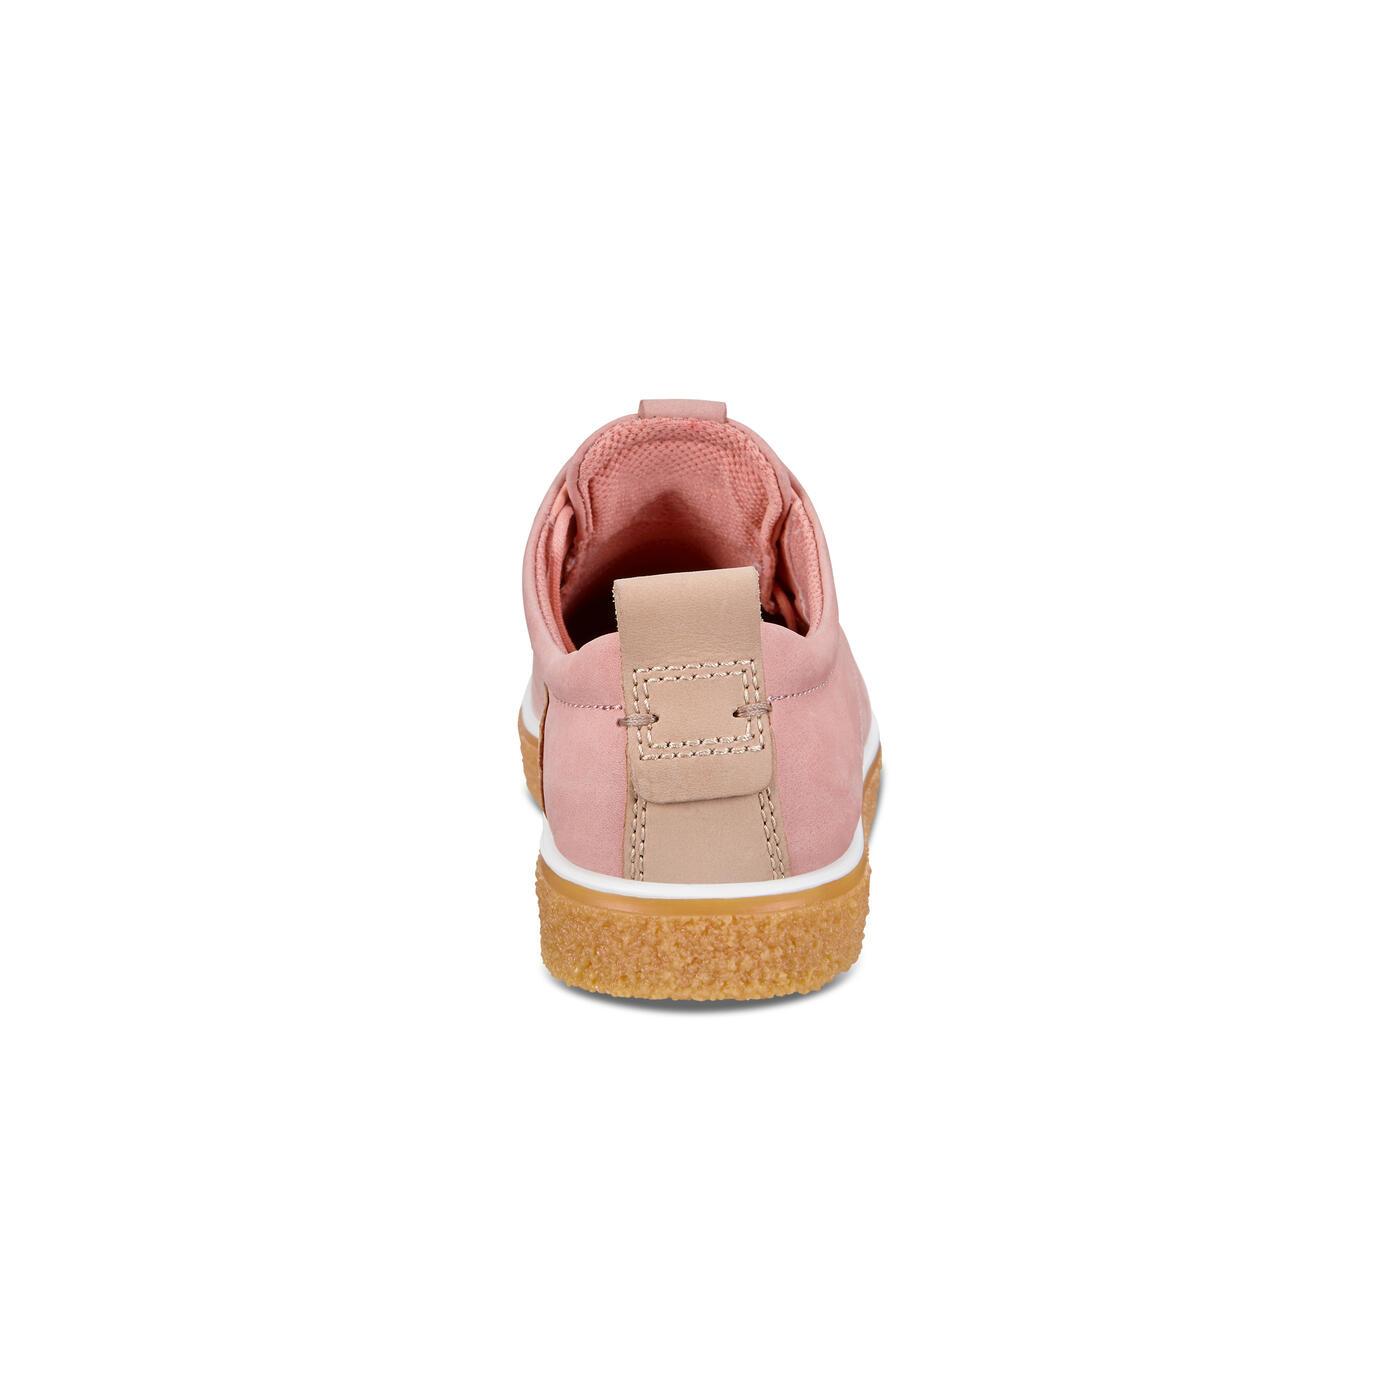 Chaussure ECCO Crepetray pour femmes